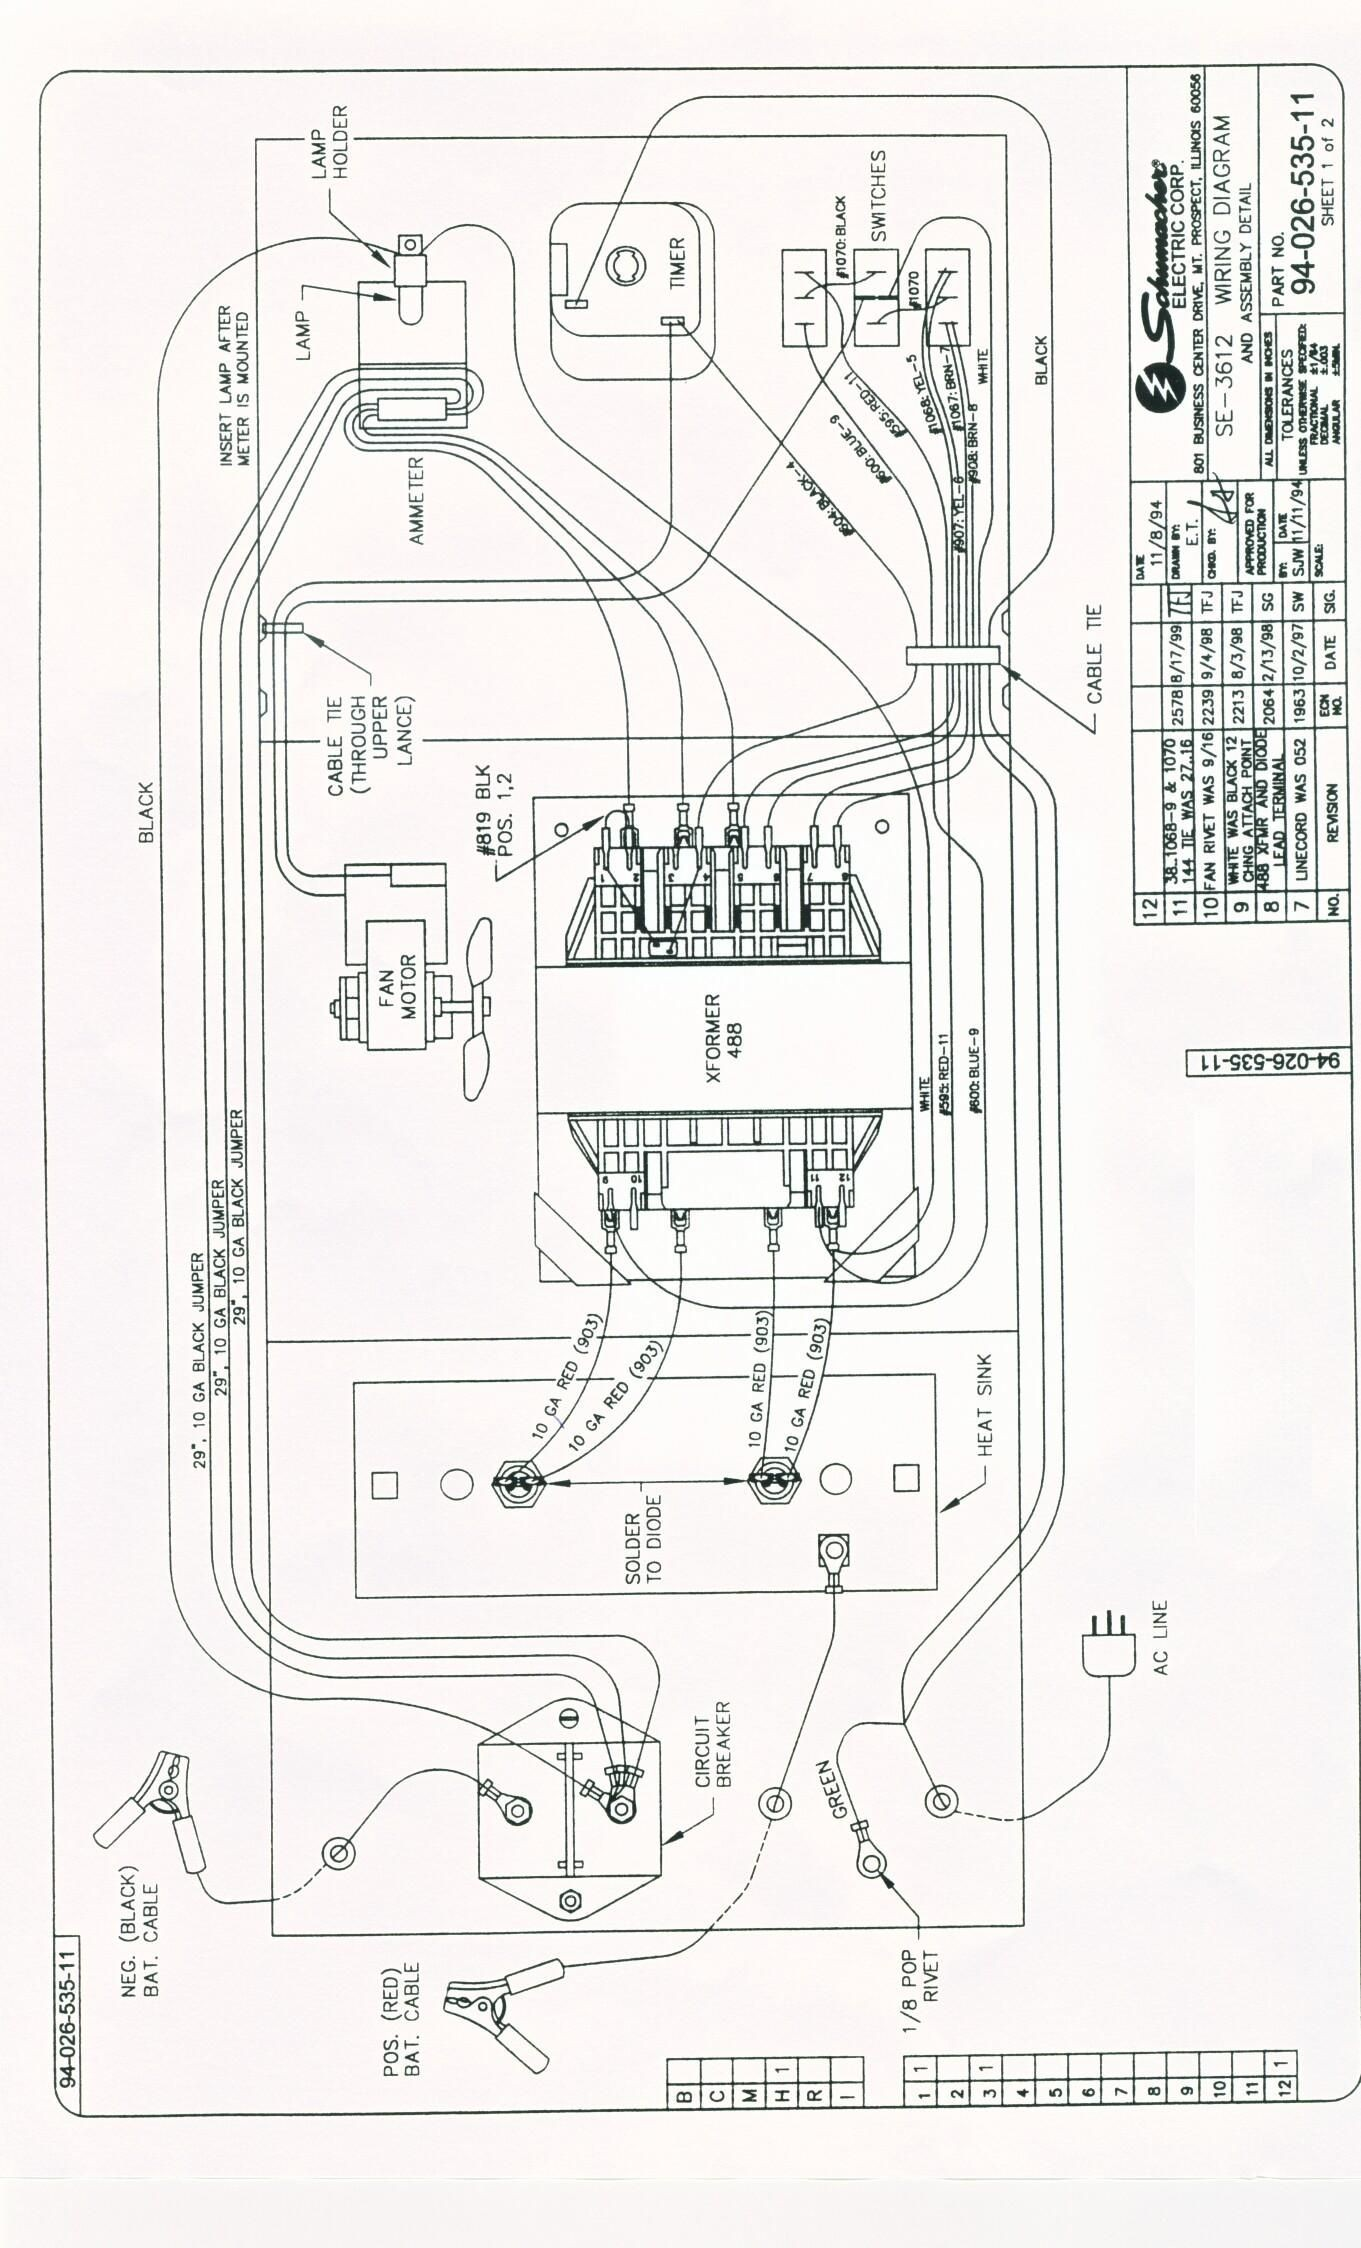 car battery charger circuit diagram my wiring diagram rh detoxicrecenze com Schumacher Battery Charger Repair Schumacher Battery Charger Manual